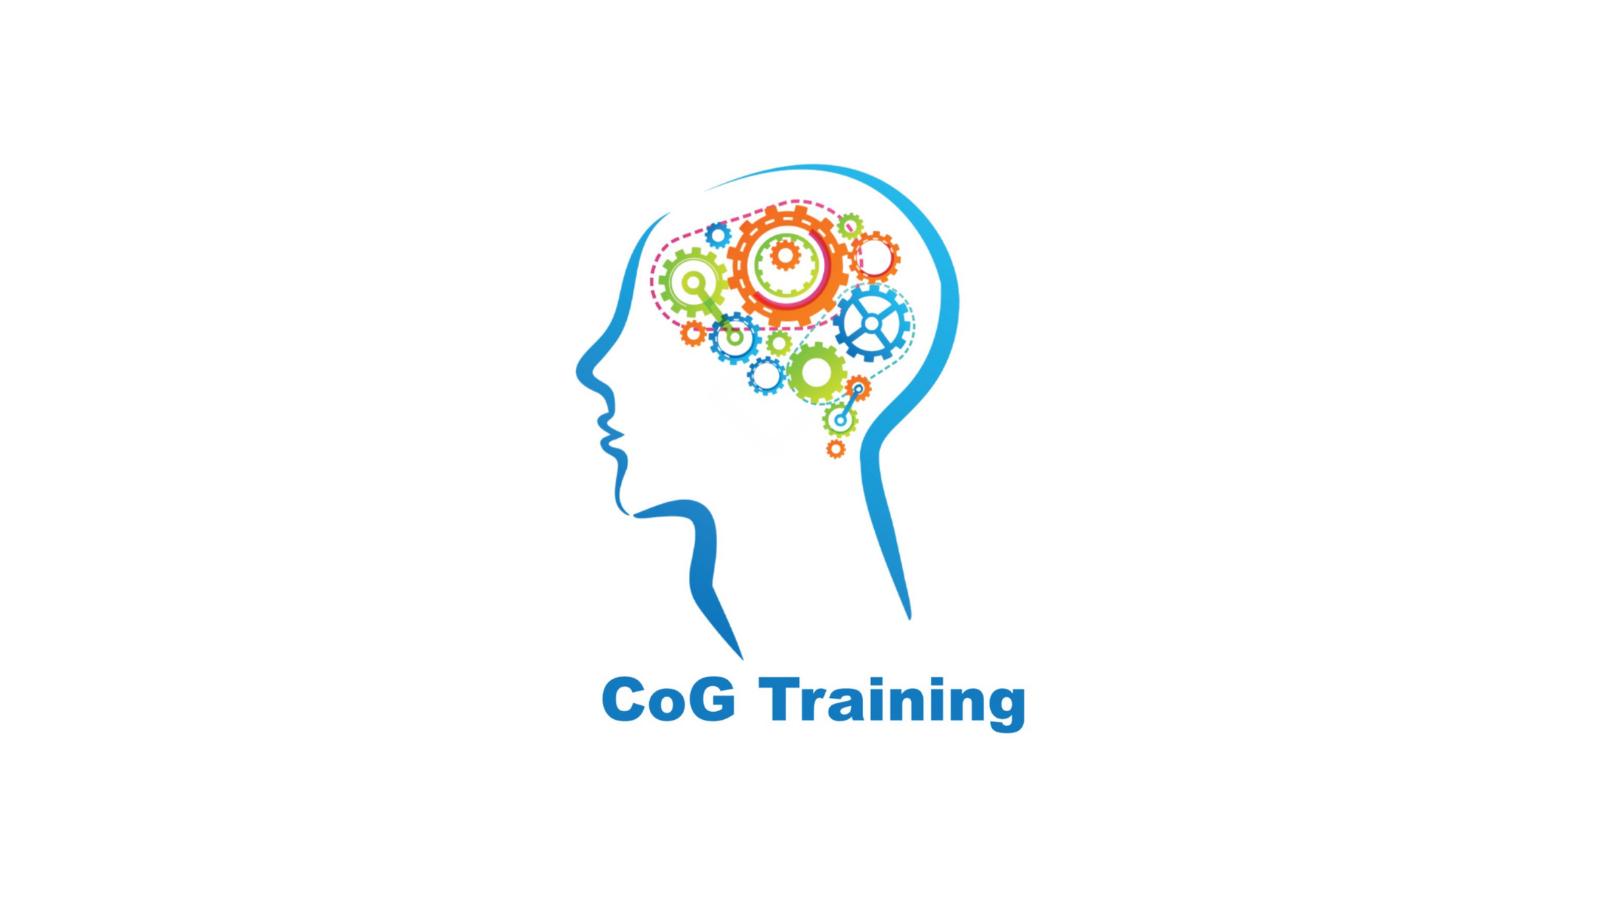 CoG Training